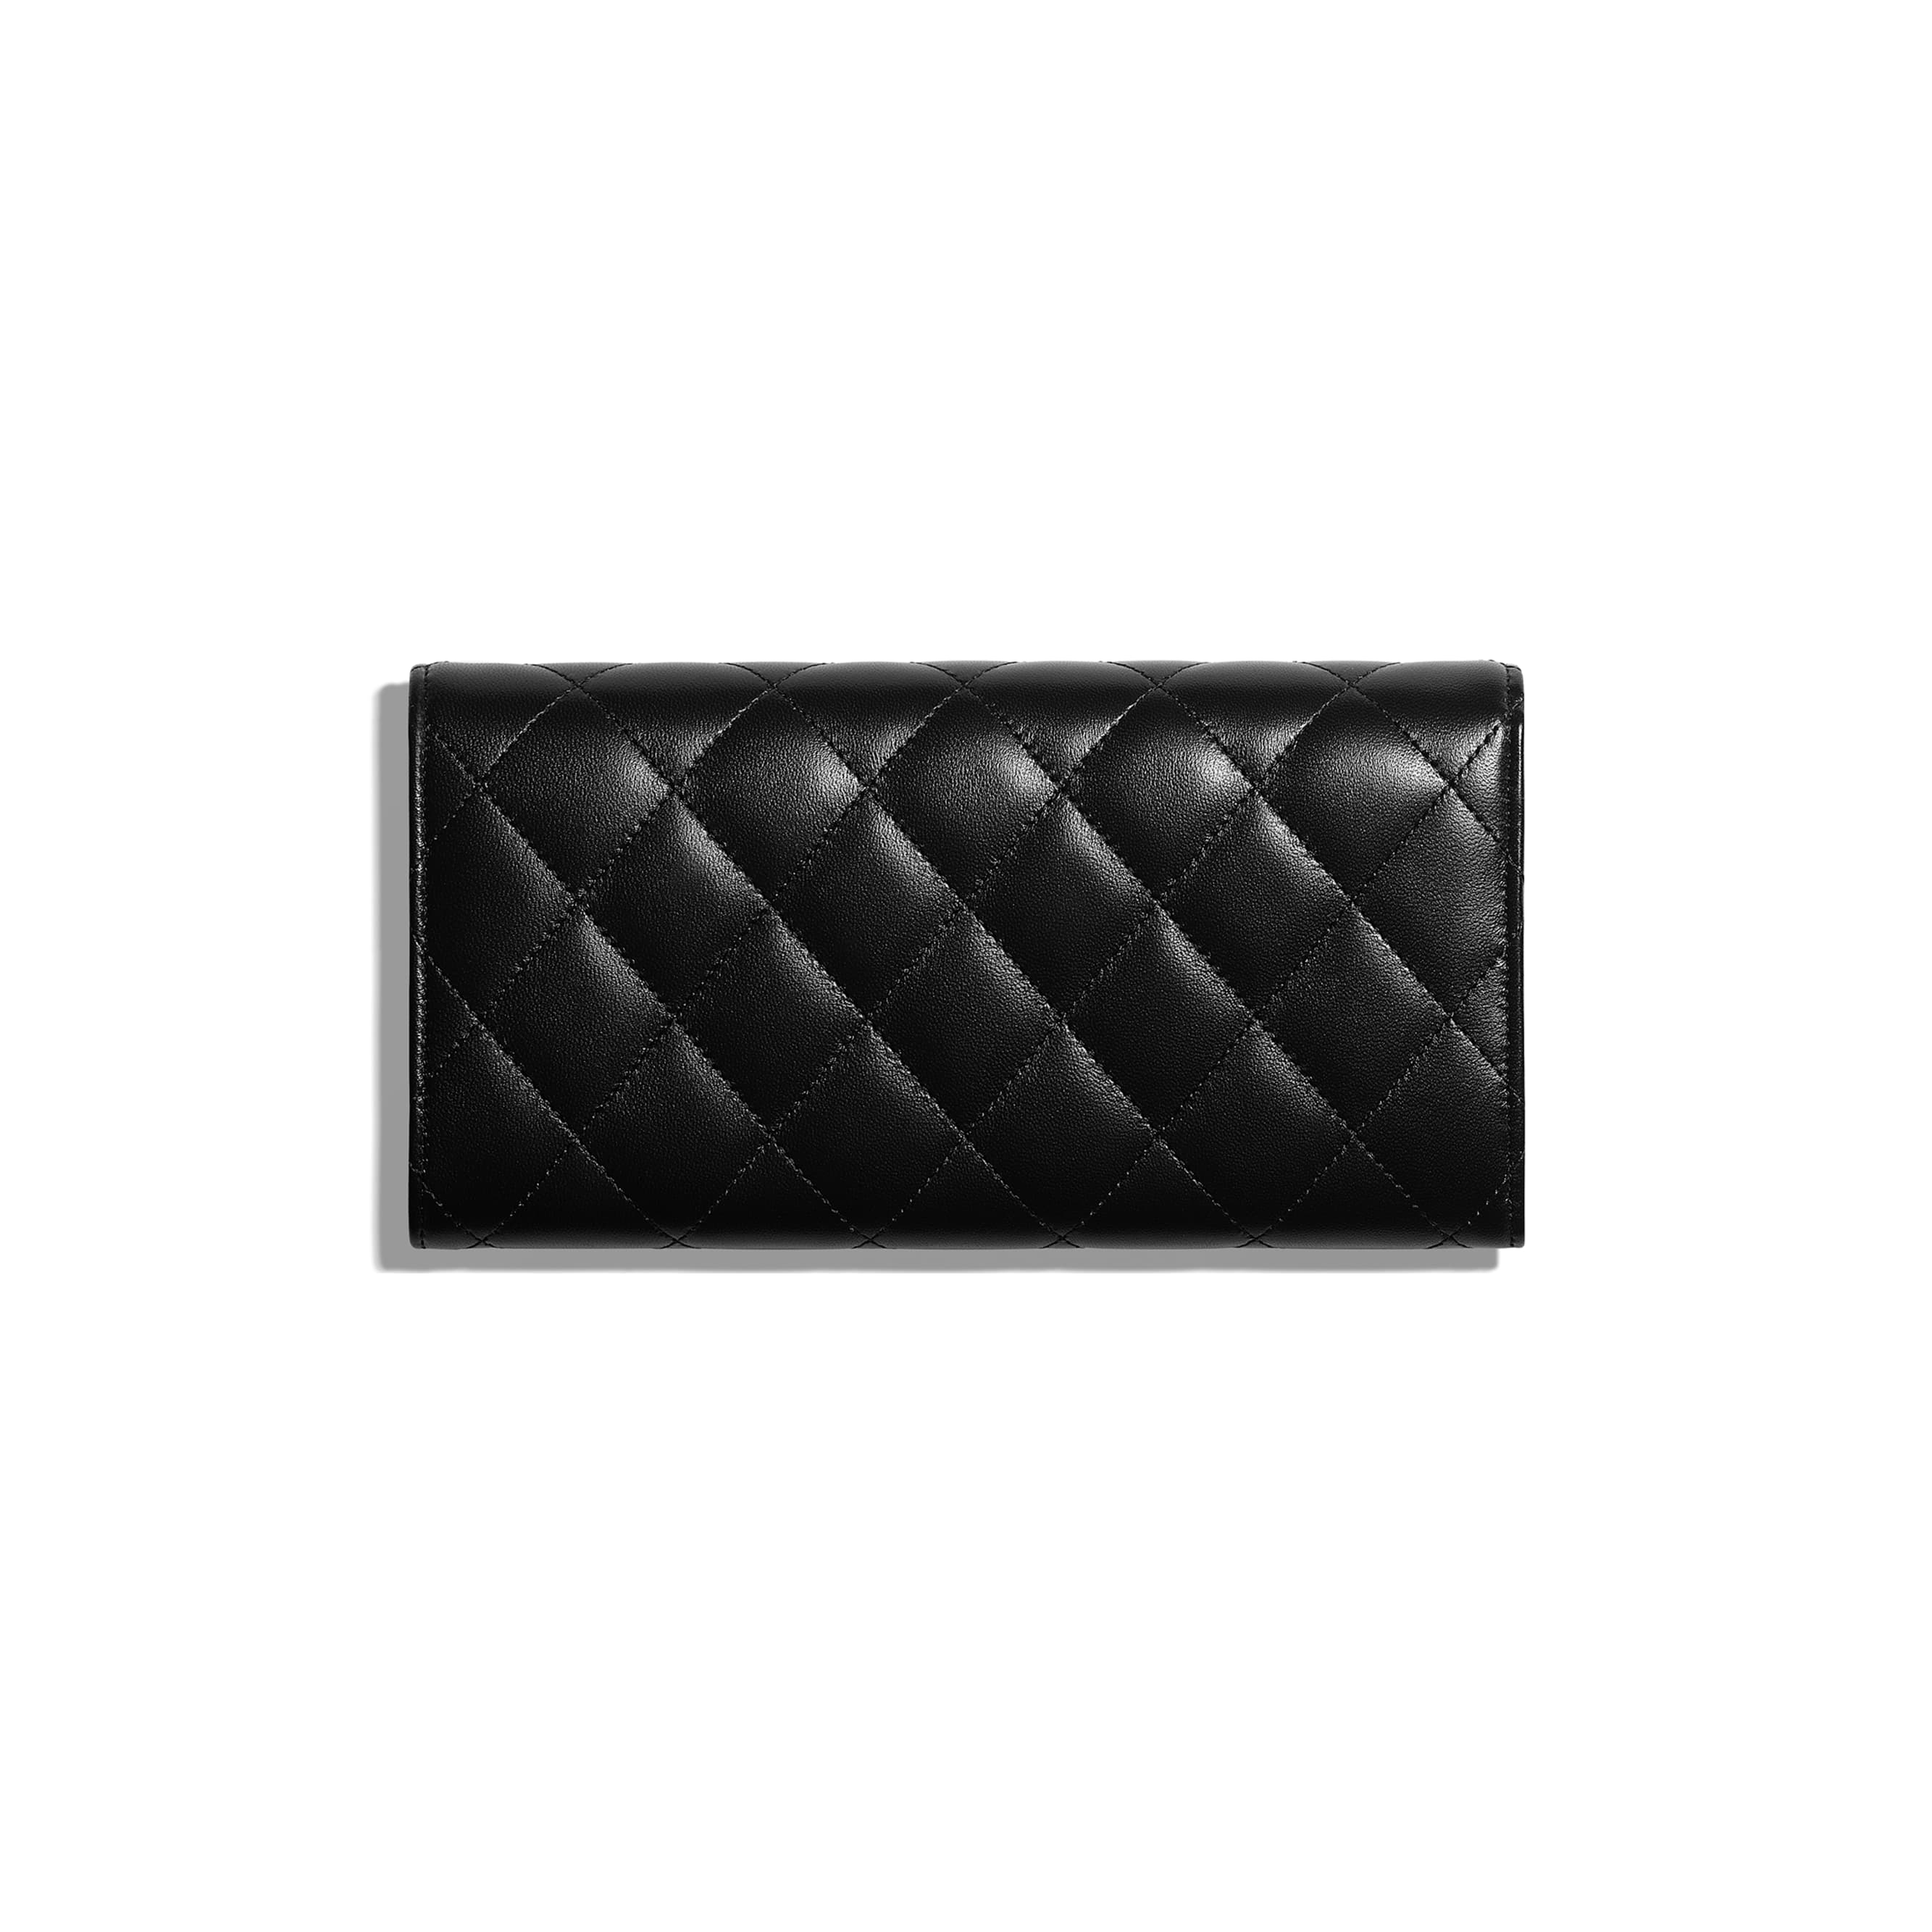 8998564dc00f ... Classic Long Flap Wallet - Black - Lambskin   Silver-Tone Metal -  Alternative view